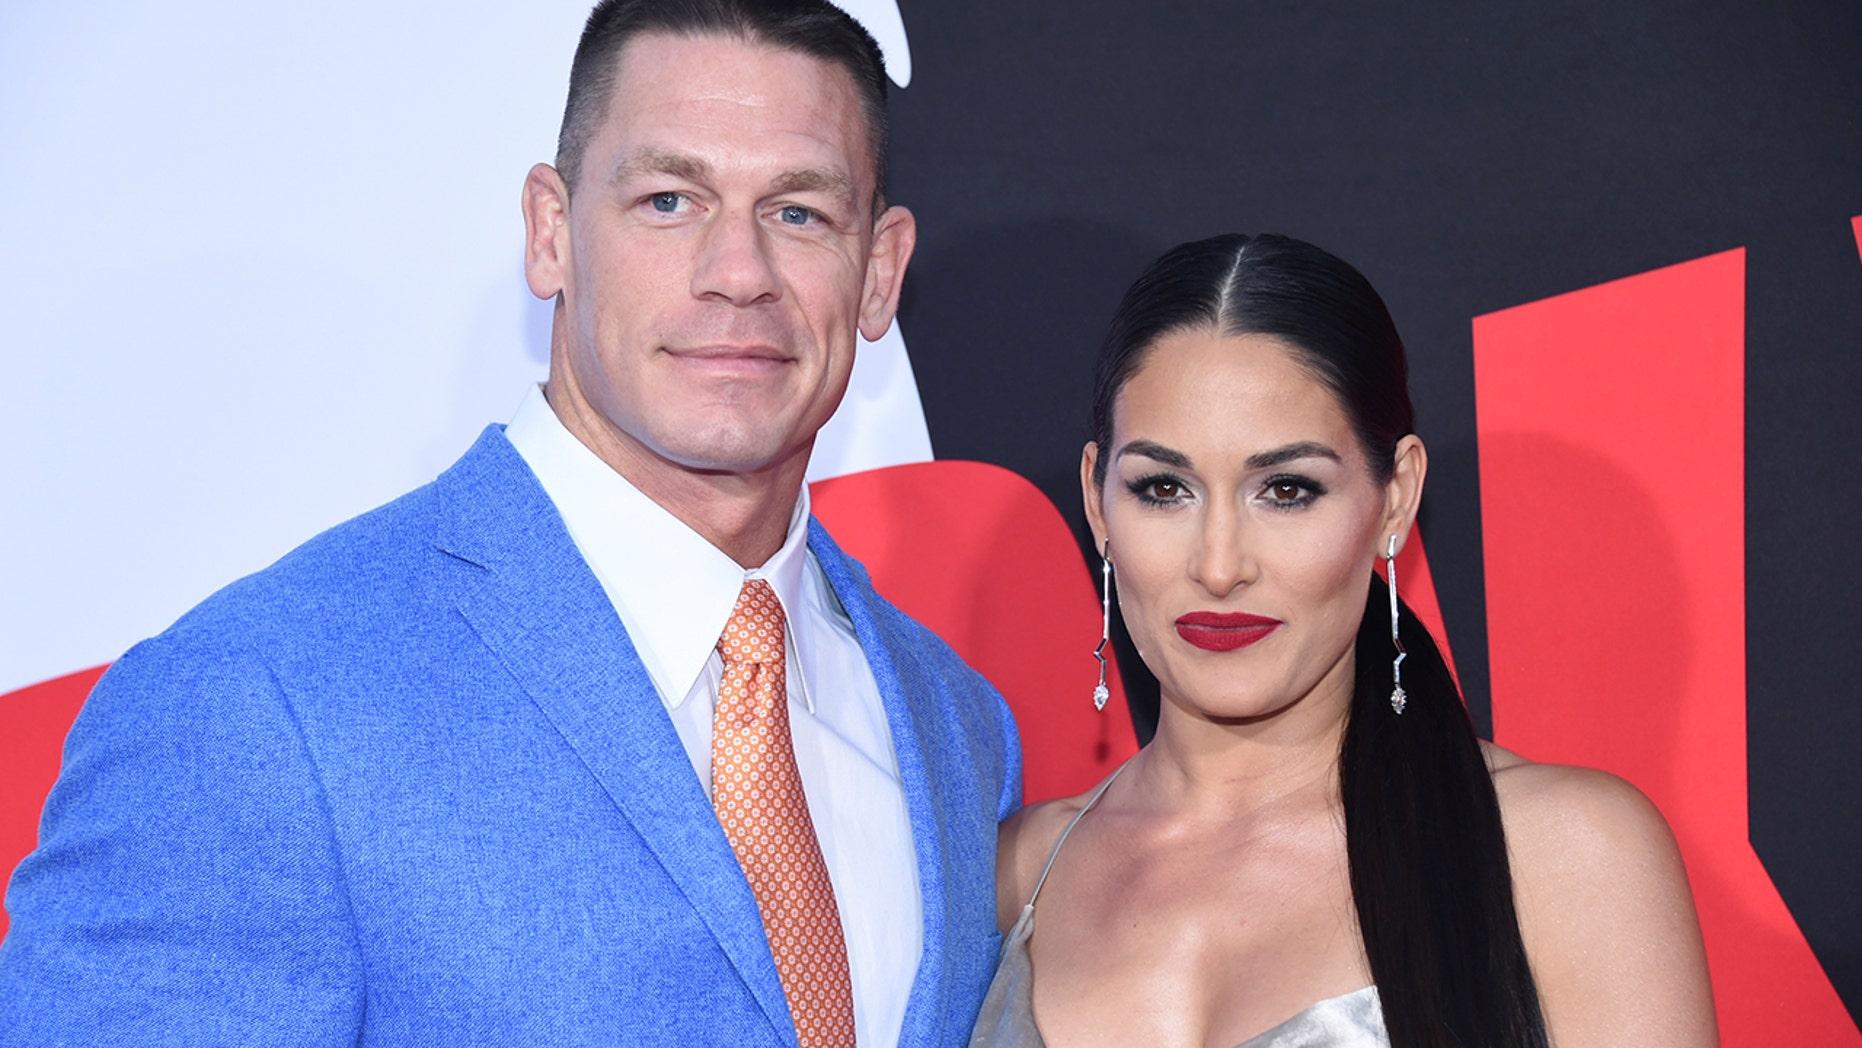 "Cast member John Cena (L) and Nikki Bella attend the premiere of ""Blockers"" in Los Angeles, California, U.S. April 3, 2018. REUTERS/Phil McCarten - RC1DBF93F9A0"